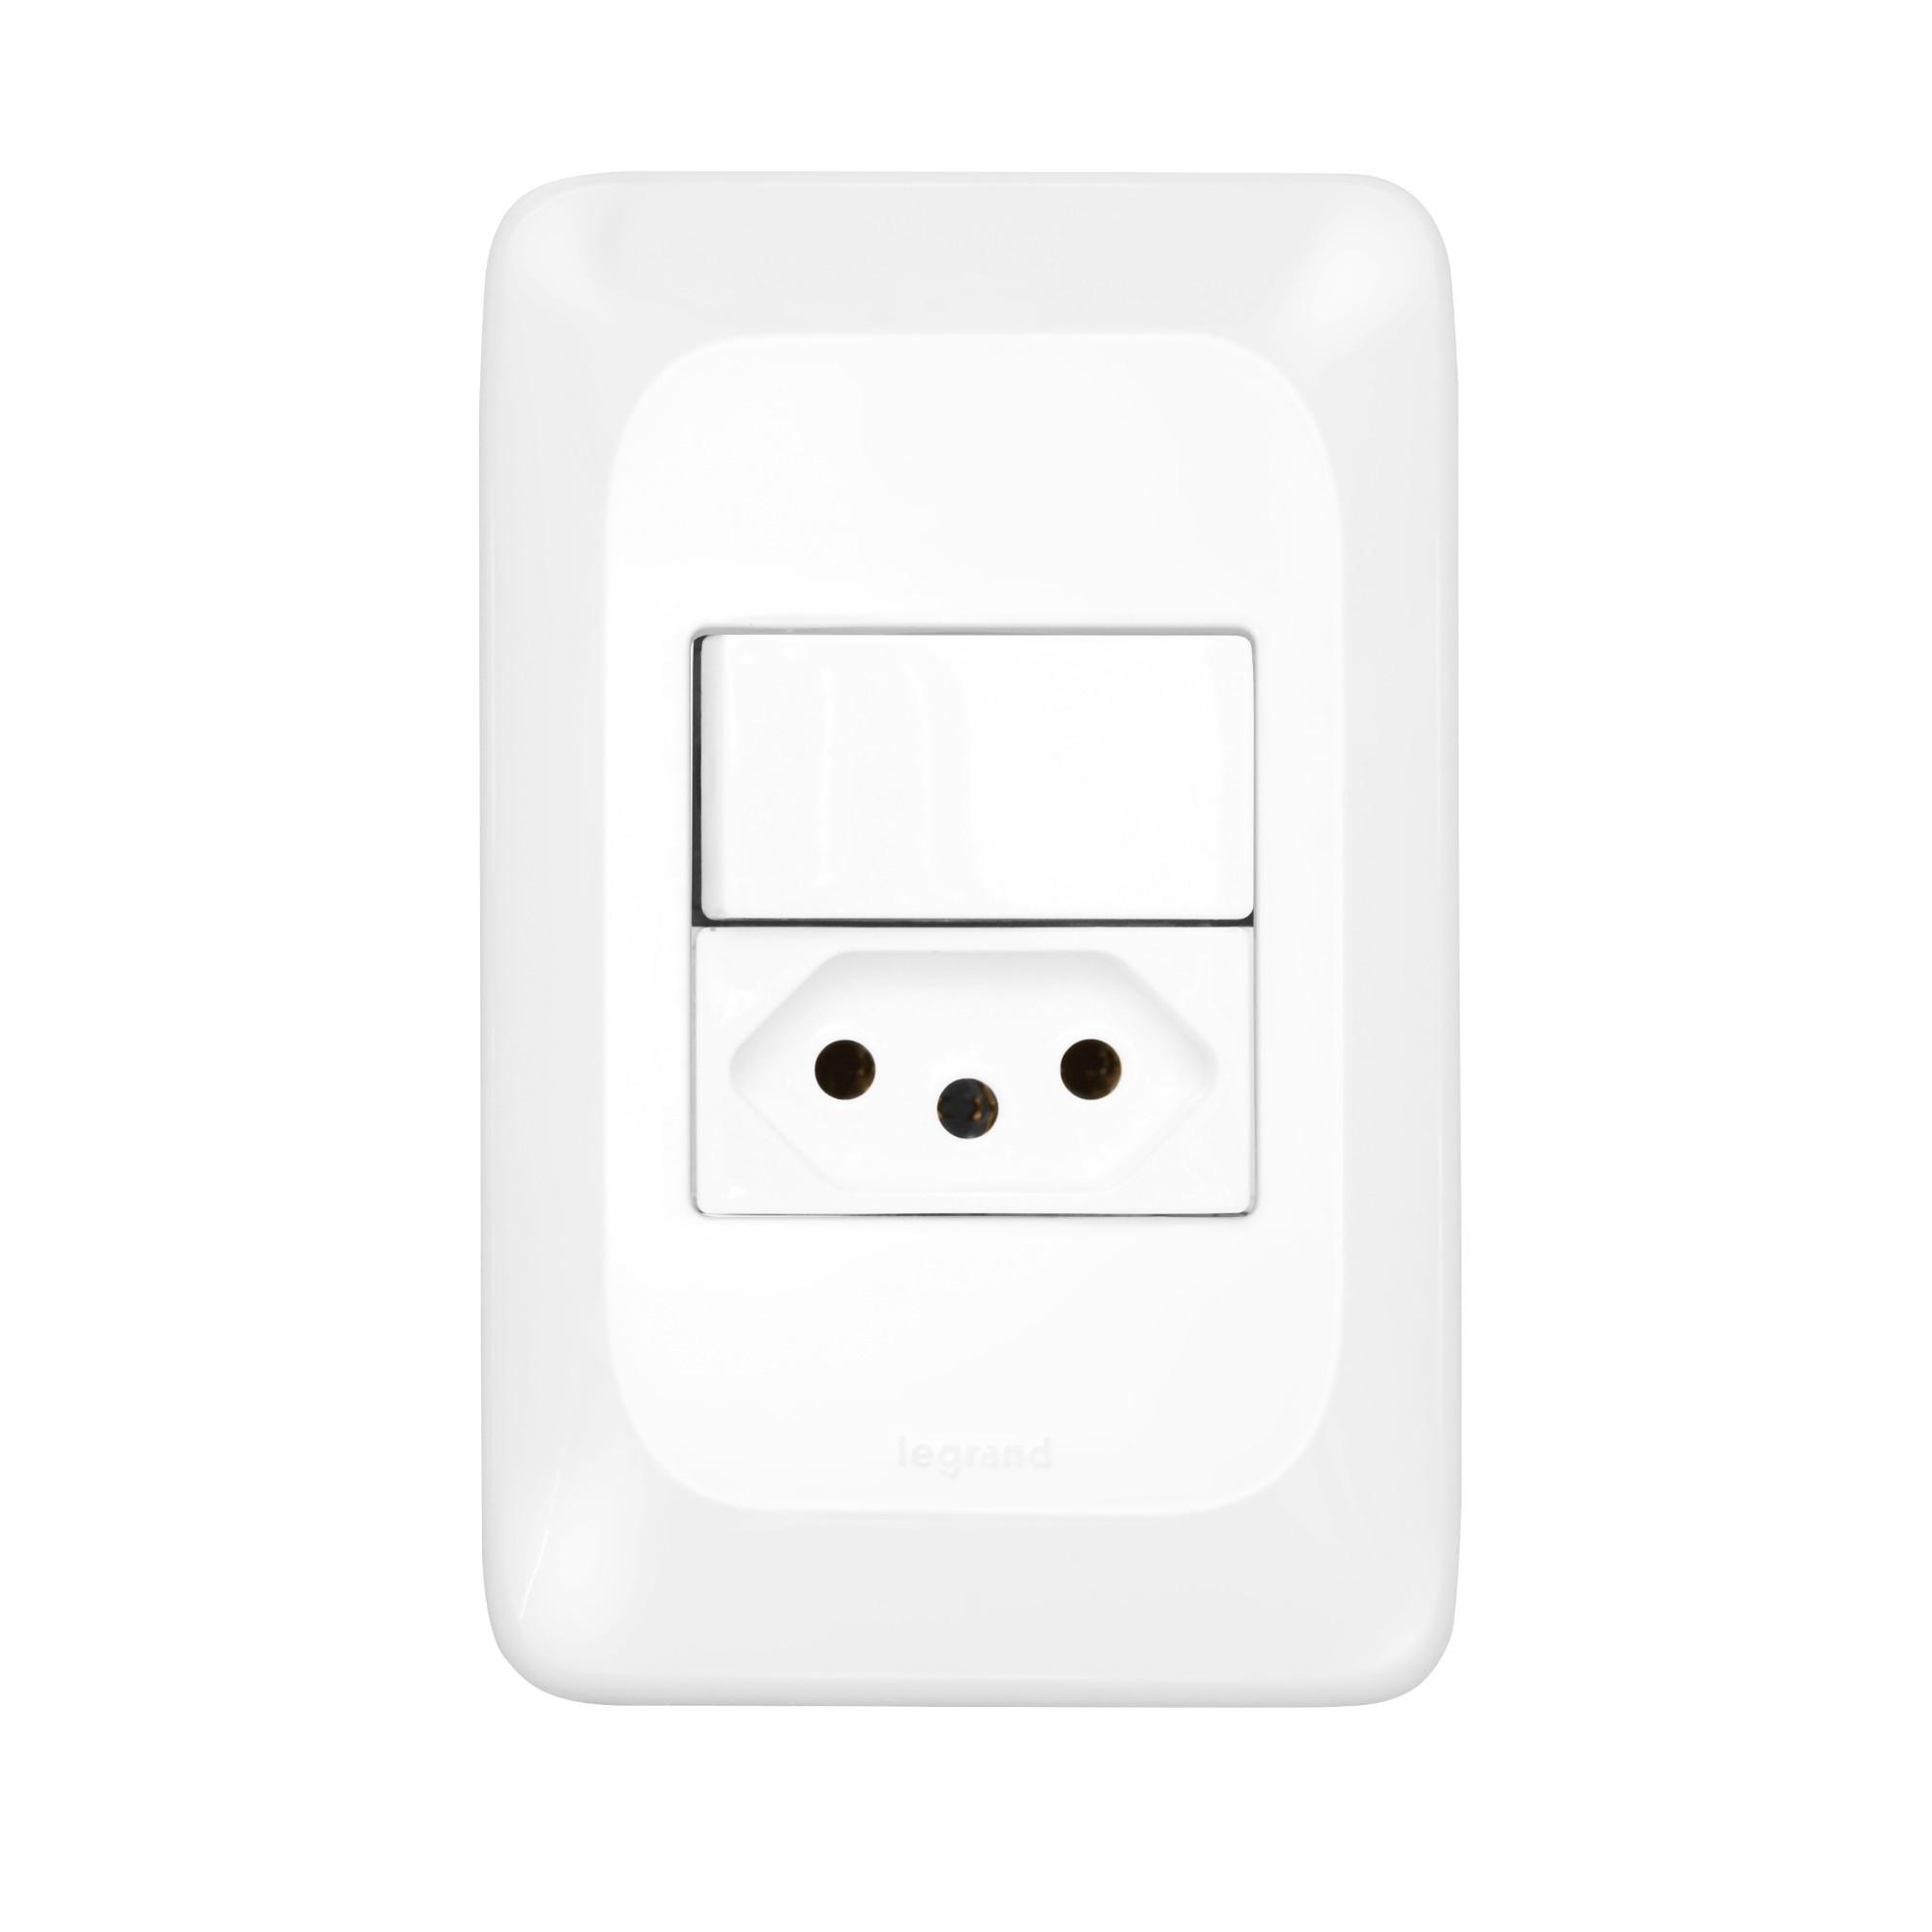 Conjunto 1 Interruptor Simples 1 Tomada 20A 2PT Linha POP 4x2 Branco - Legrand